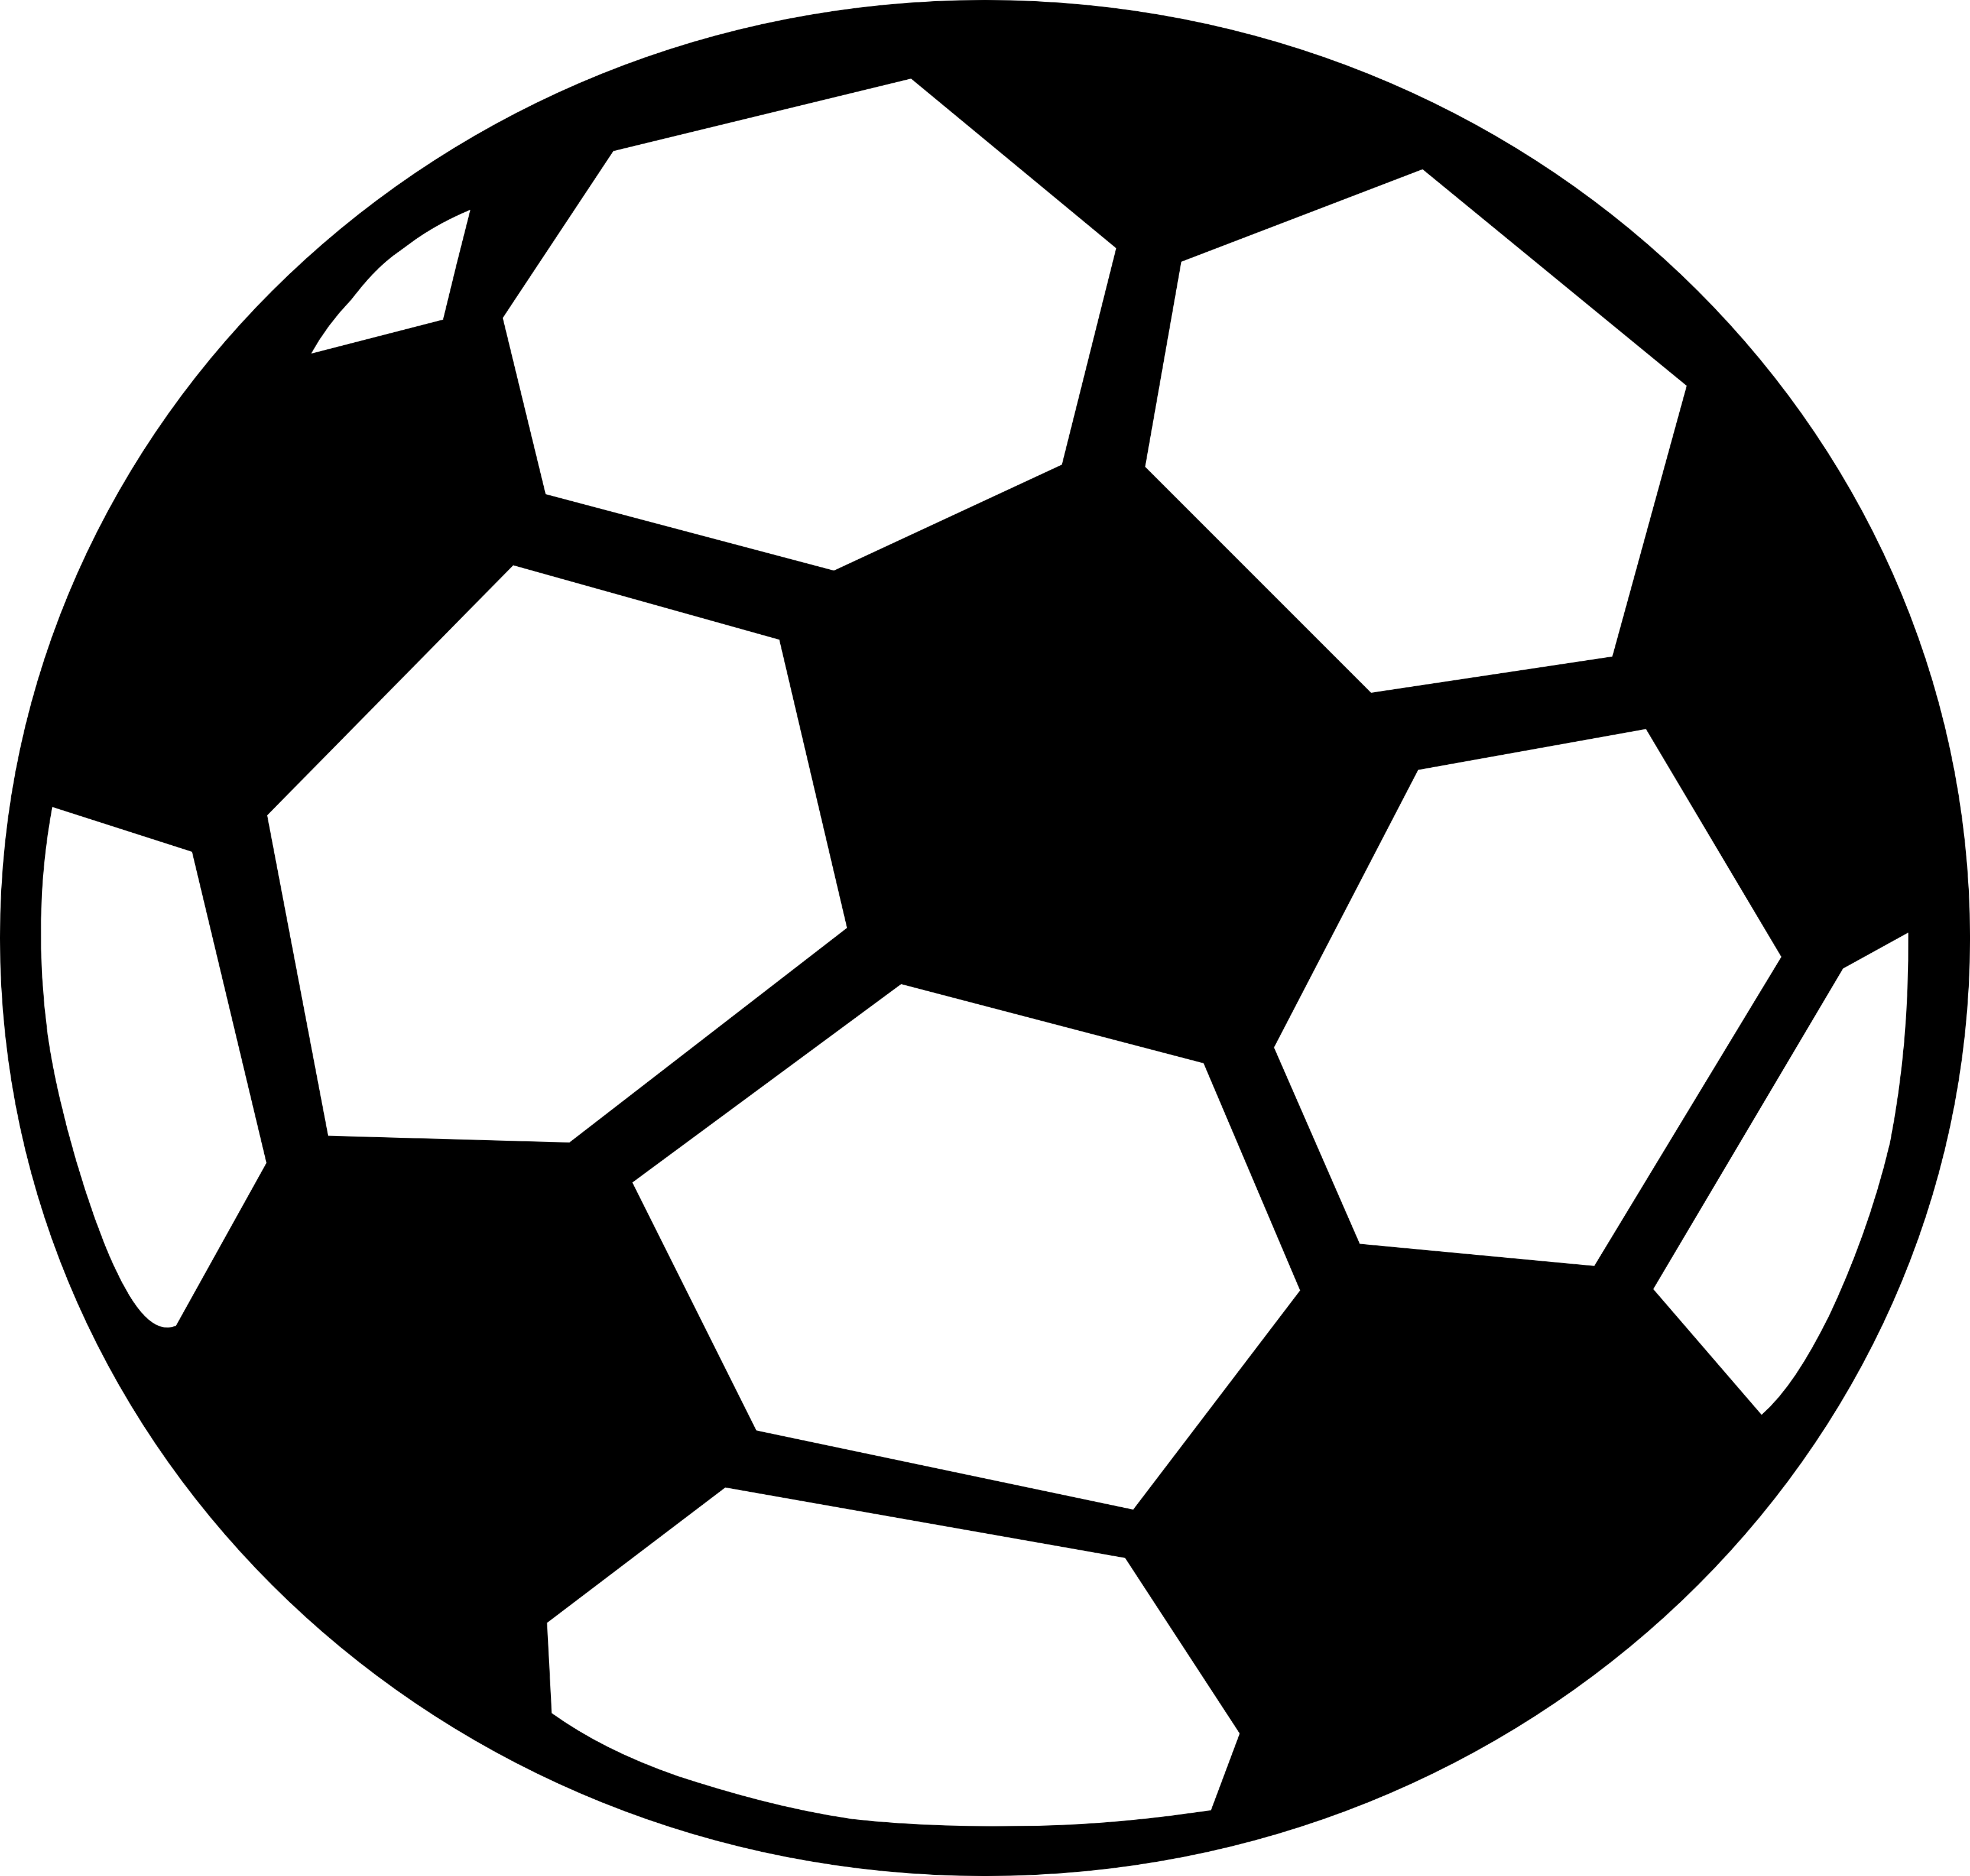 Basketball soccer ball clipart svg library Soccer Ball And Basketball - Clip Art Library svg library